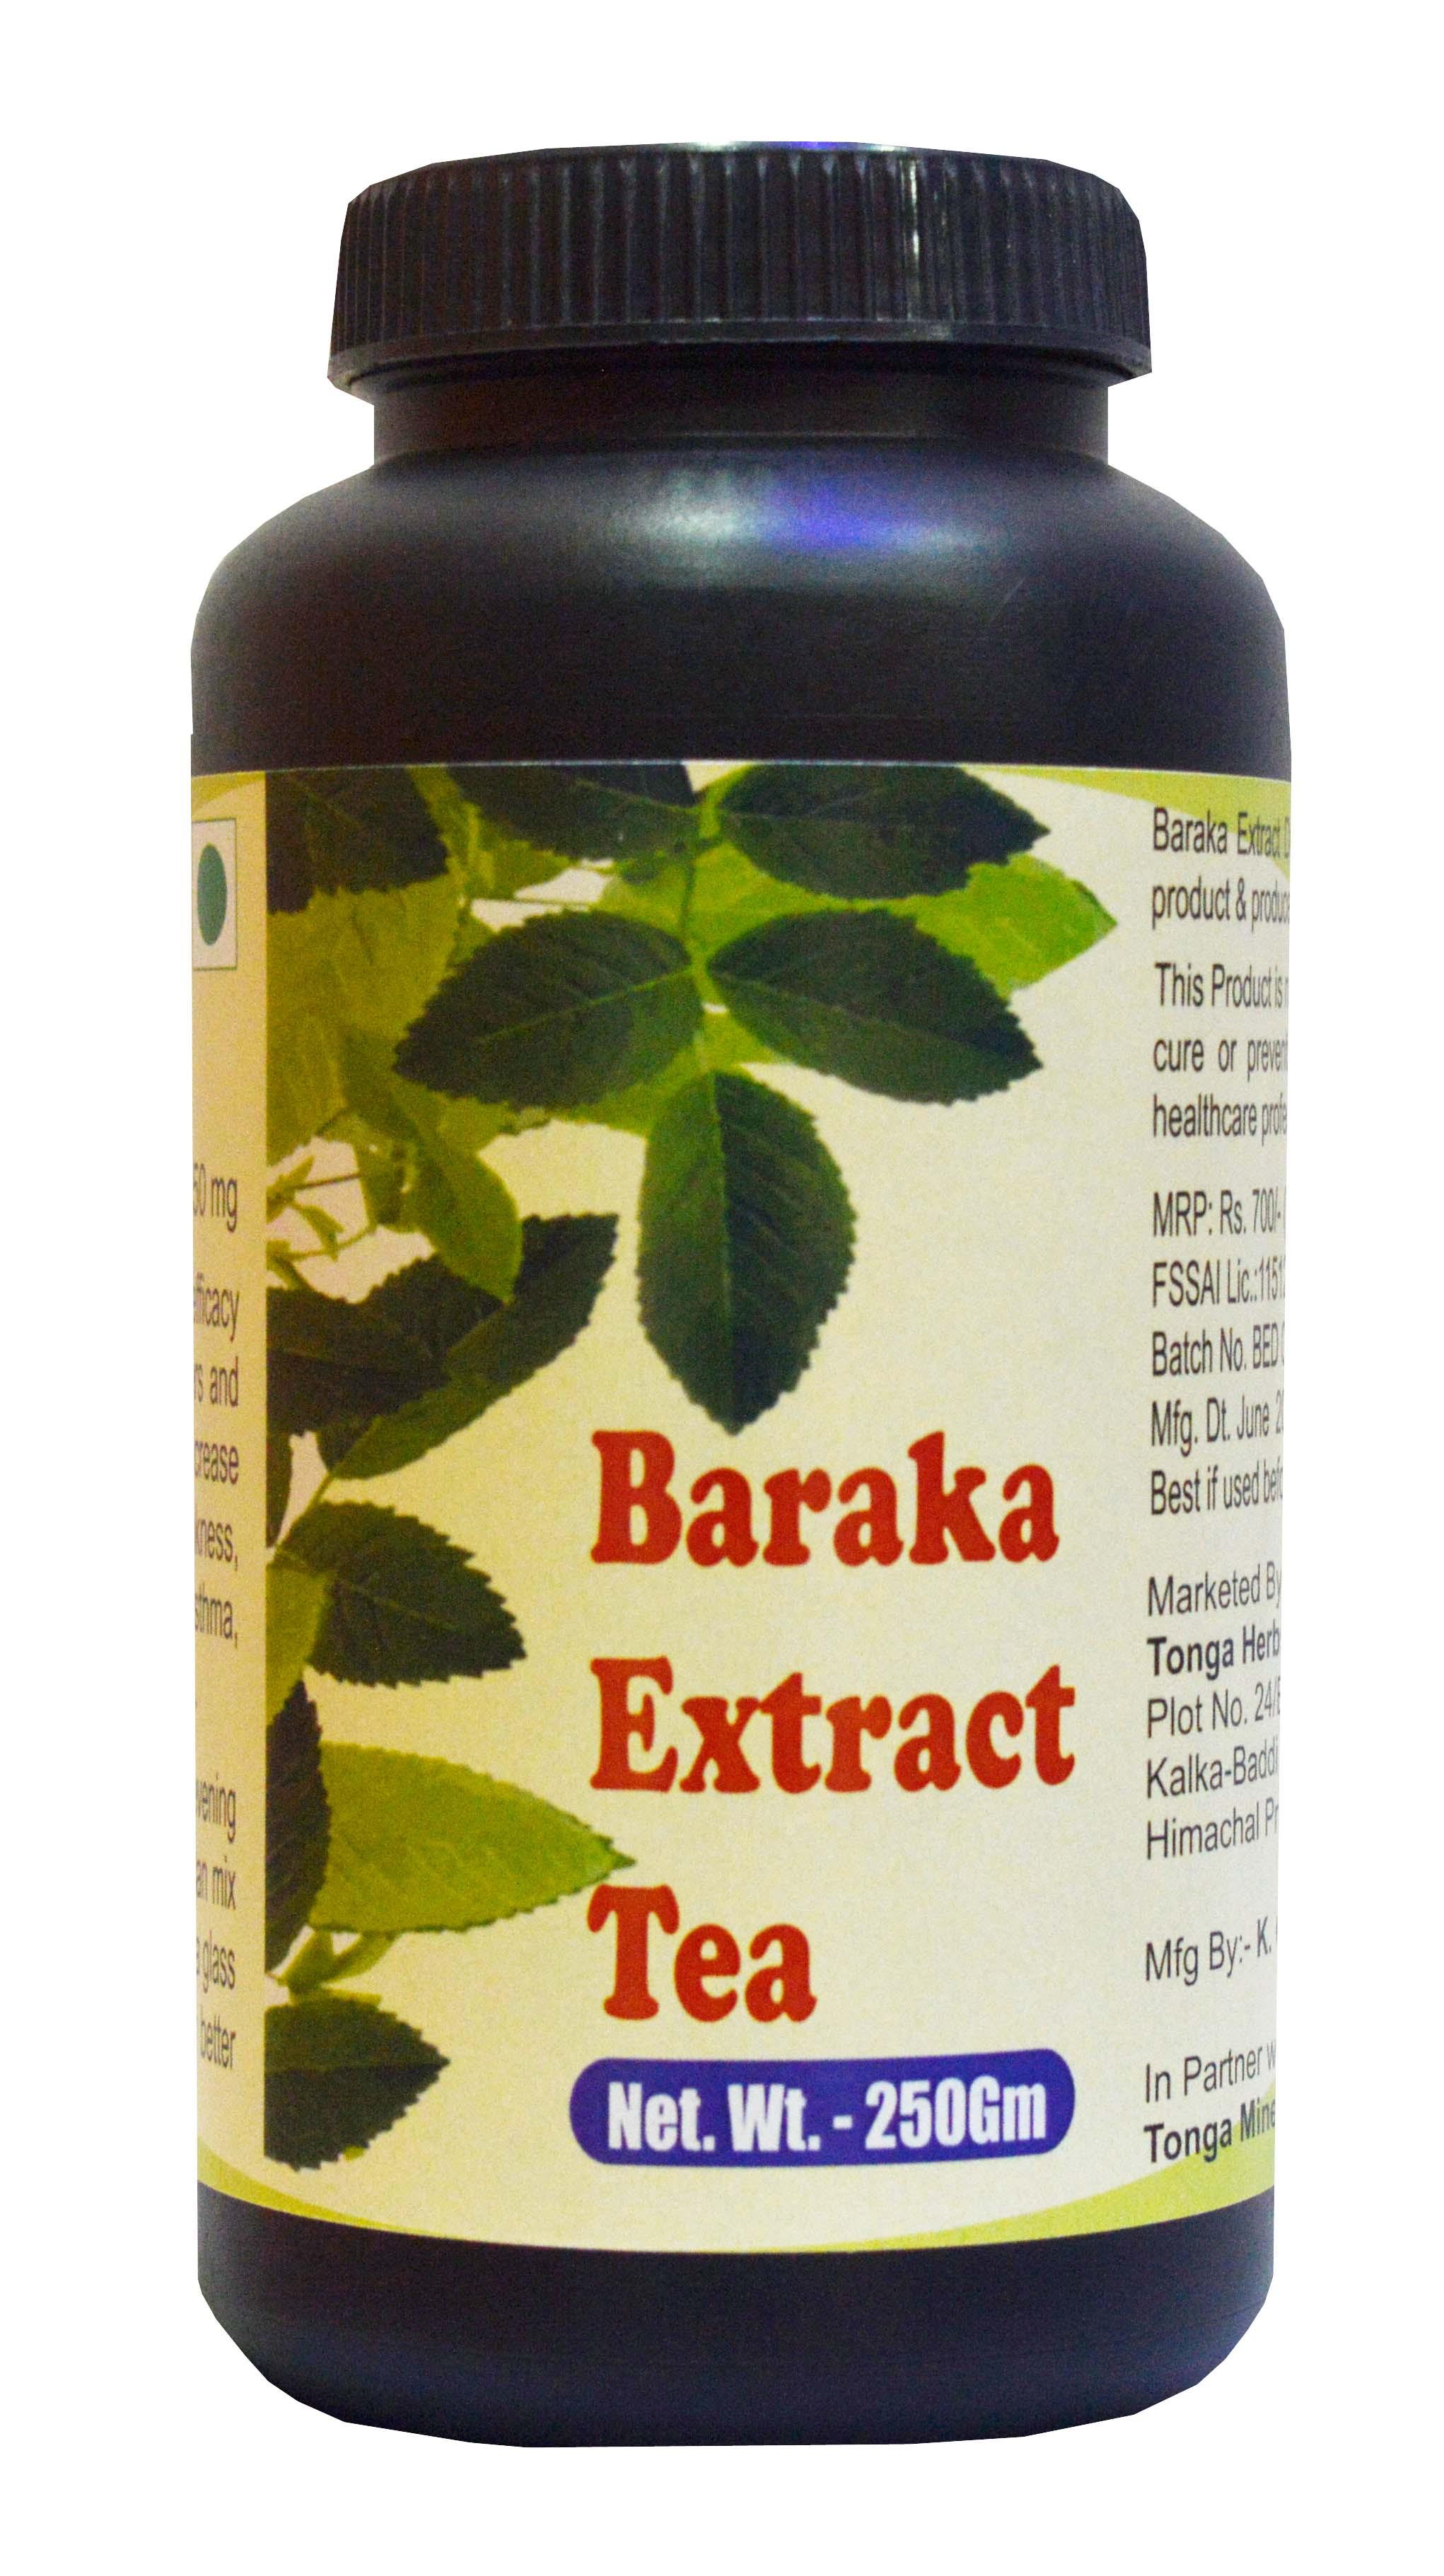 Tonga Herbs Baraka Extract Tea - 250 Gm (Buy Any Supplement Get The Same 60ml Drops Free)